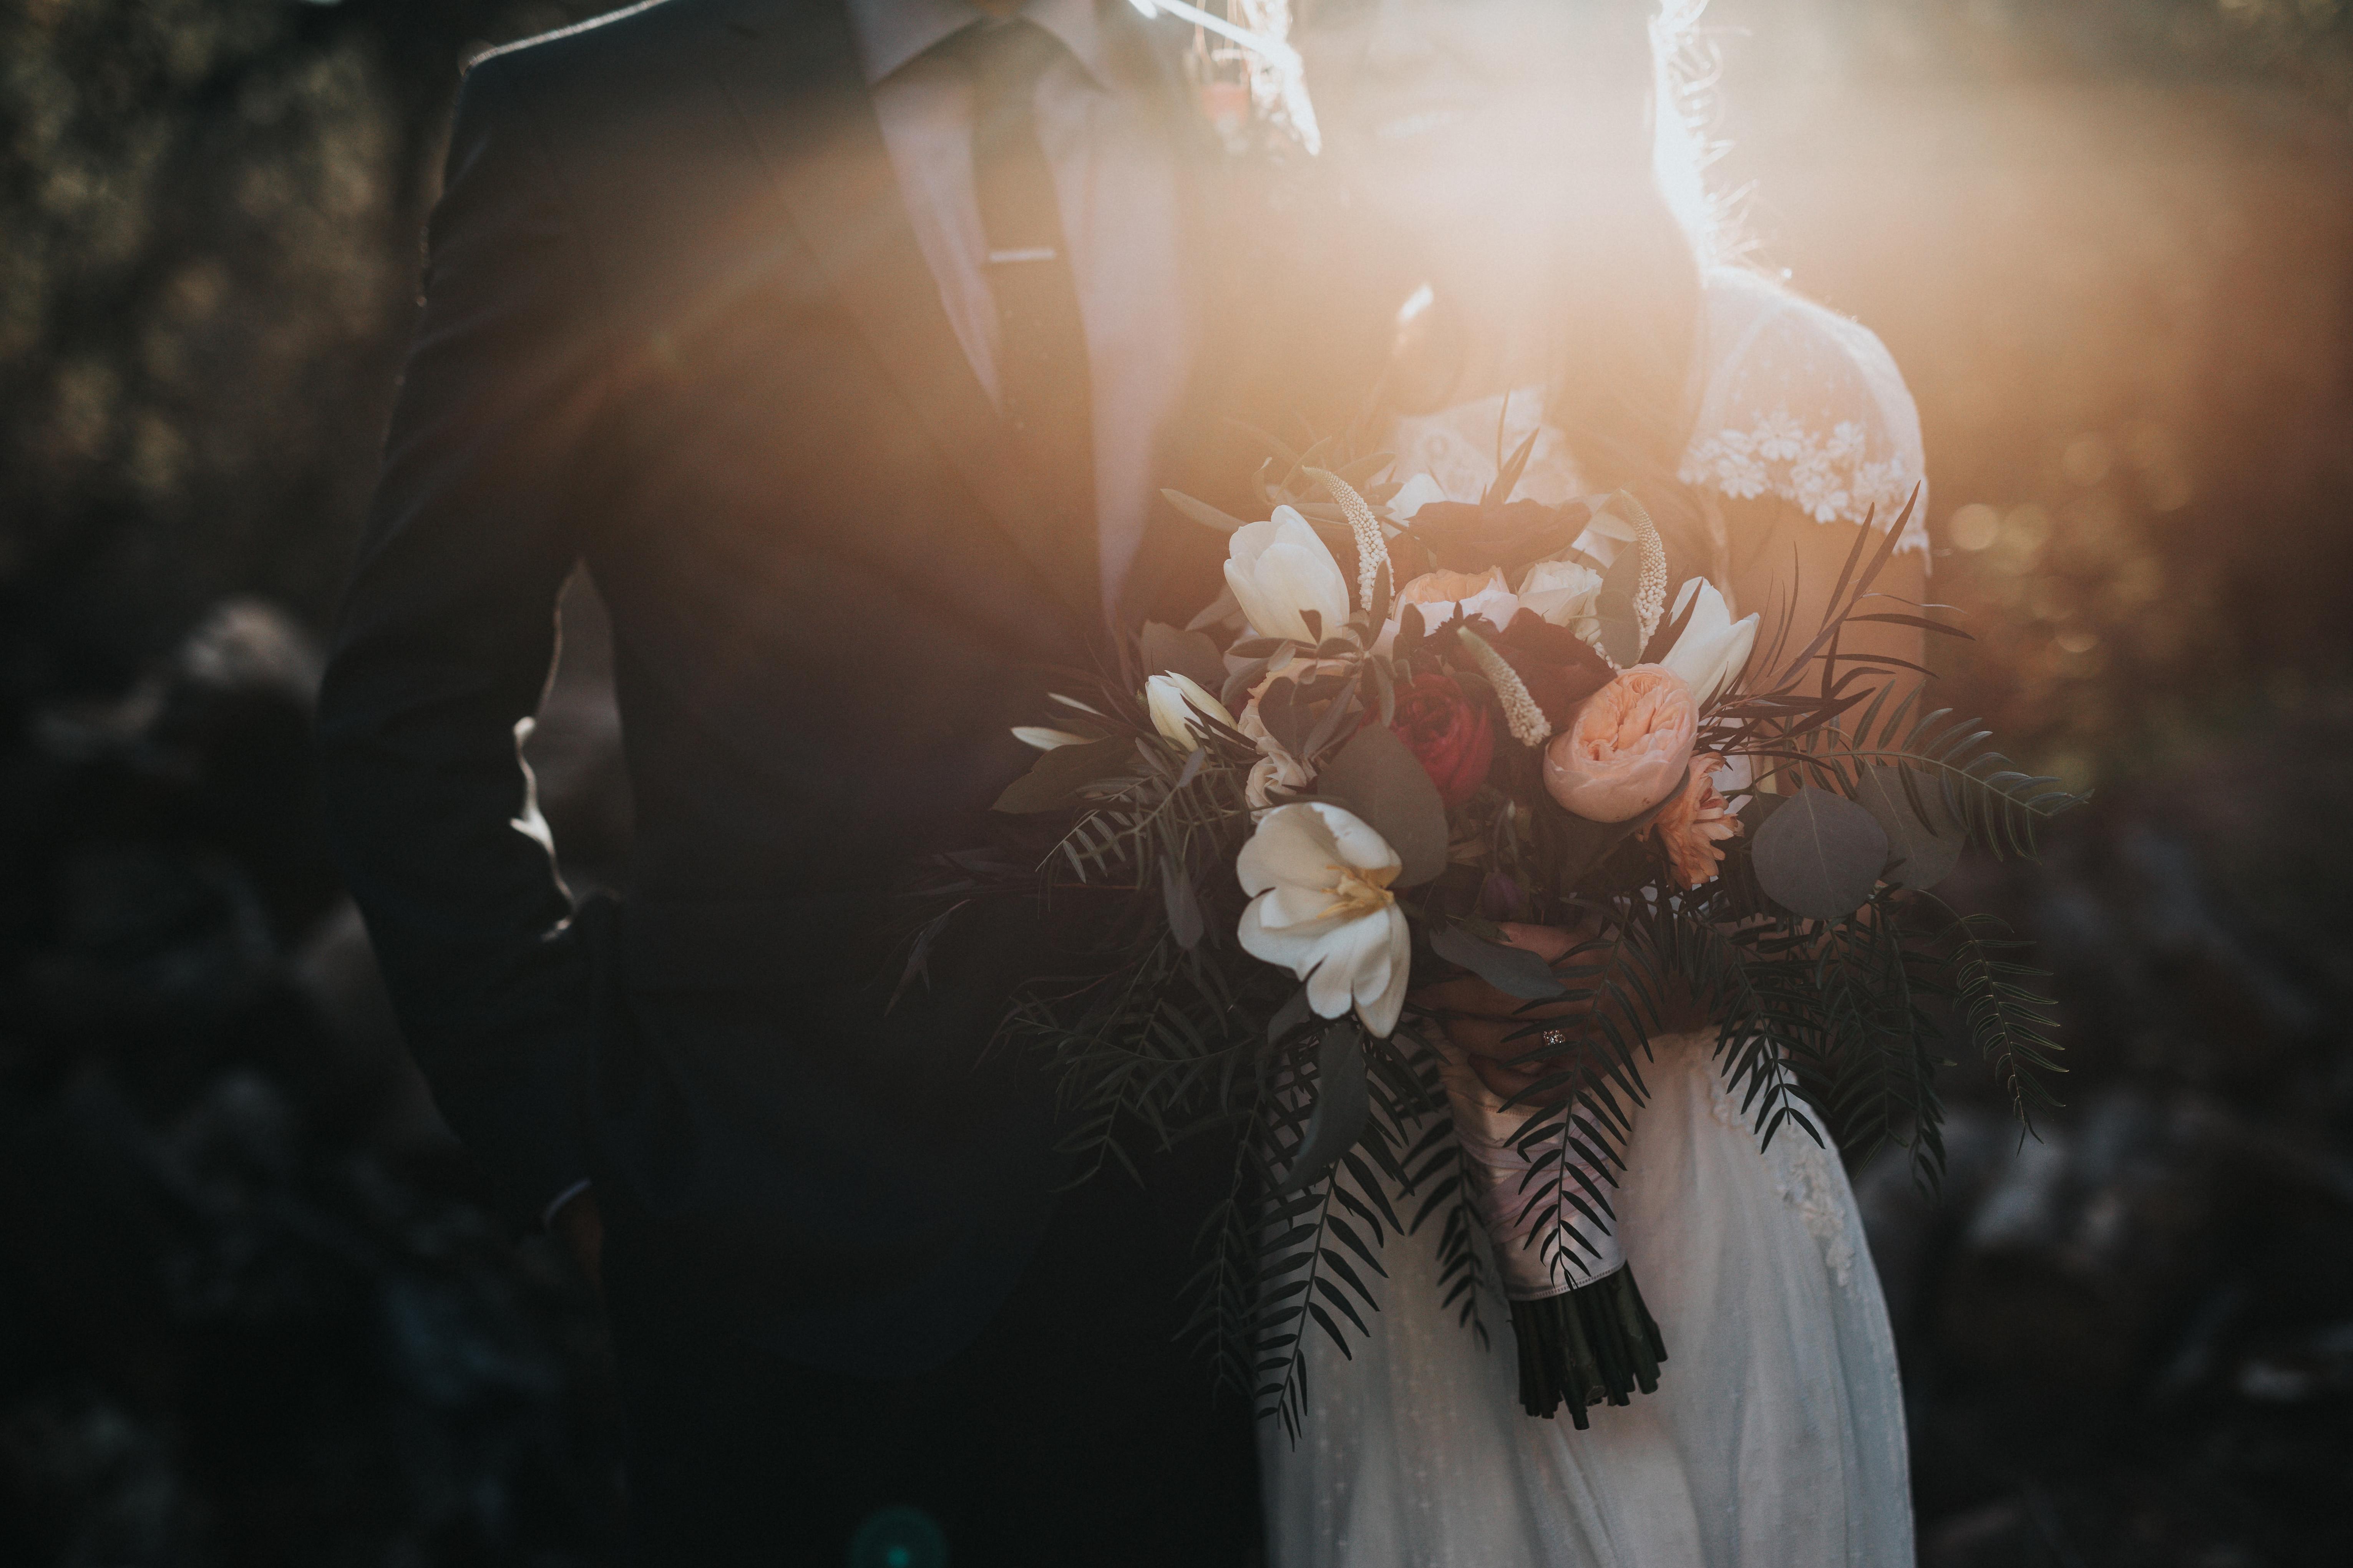 Wedding / Engagement Services